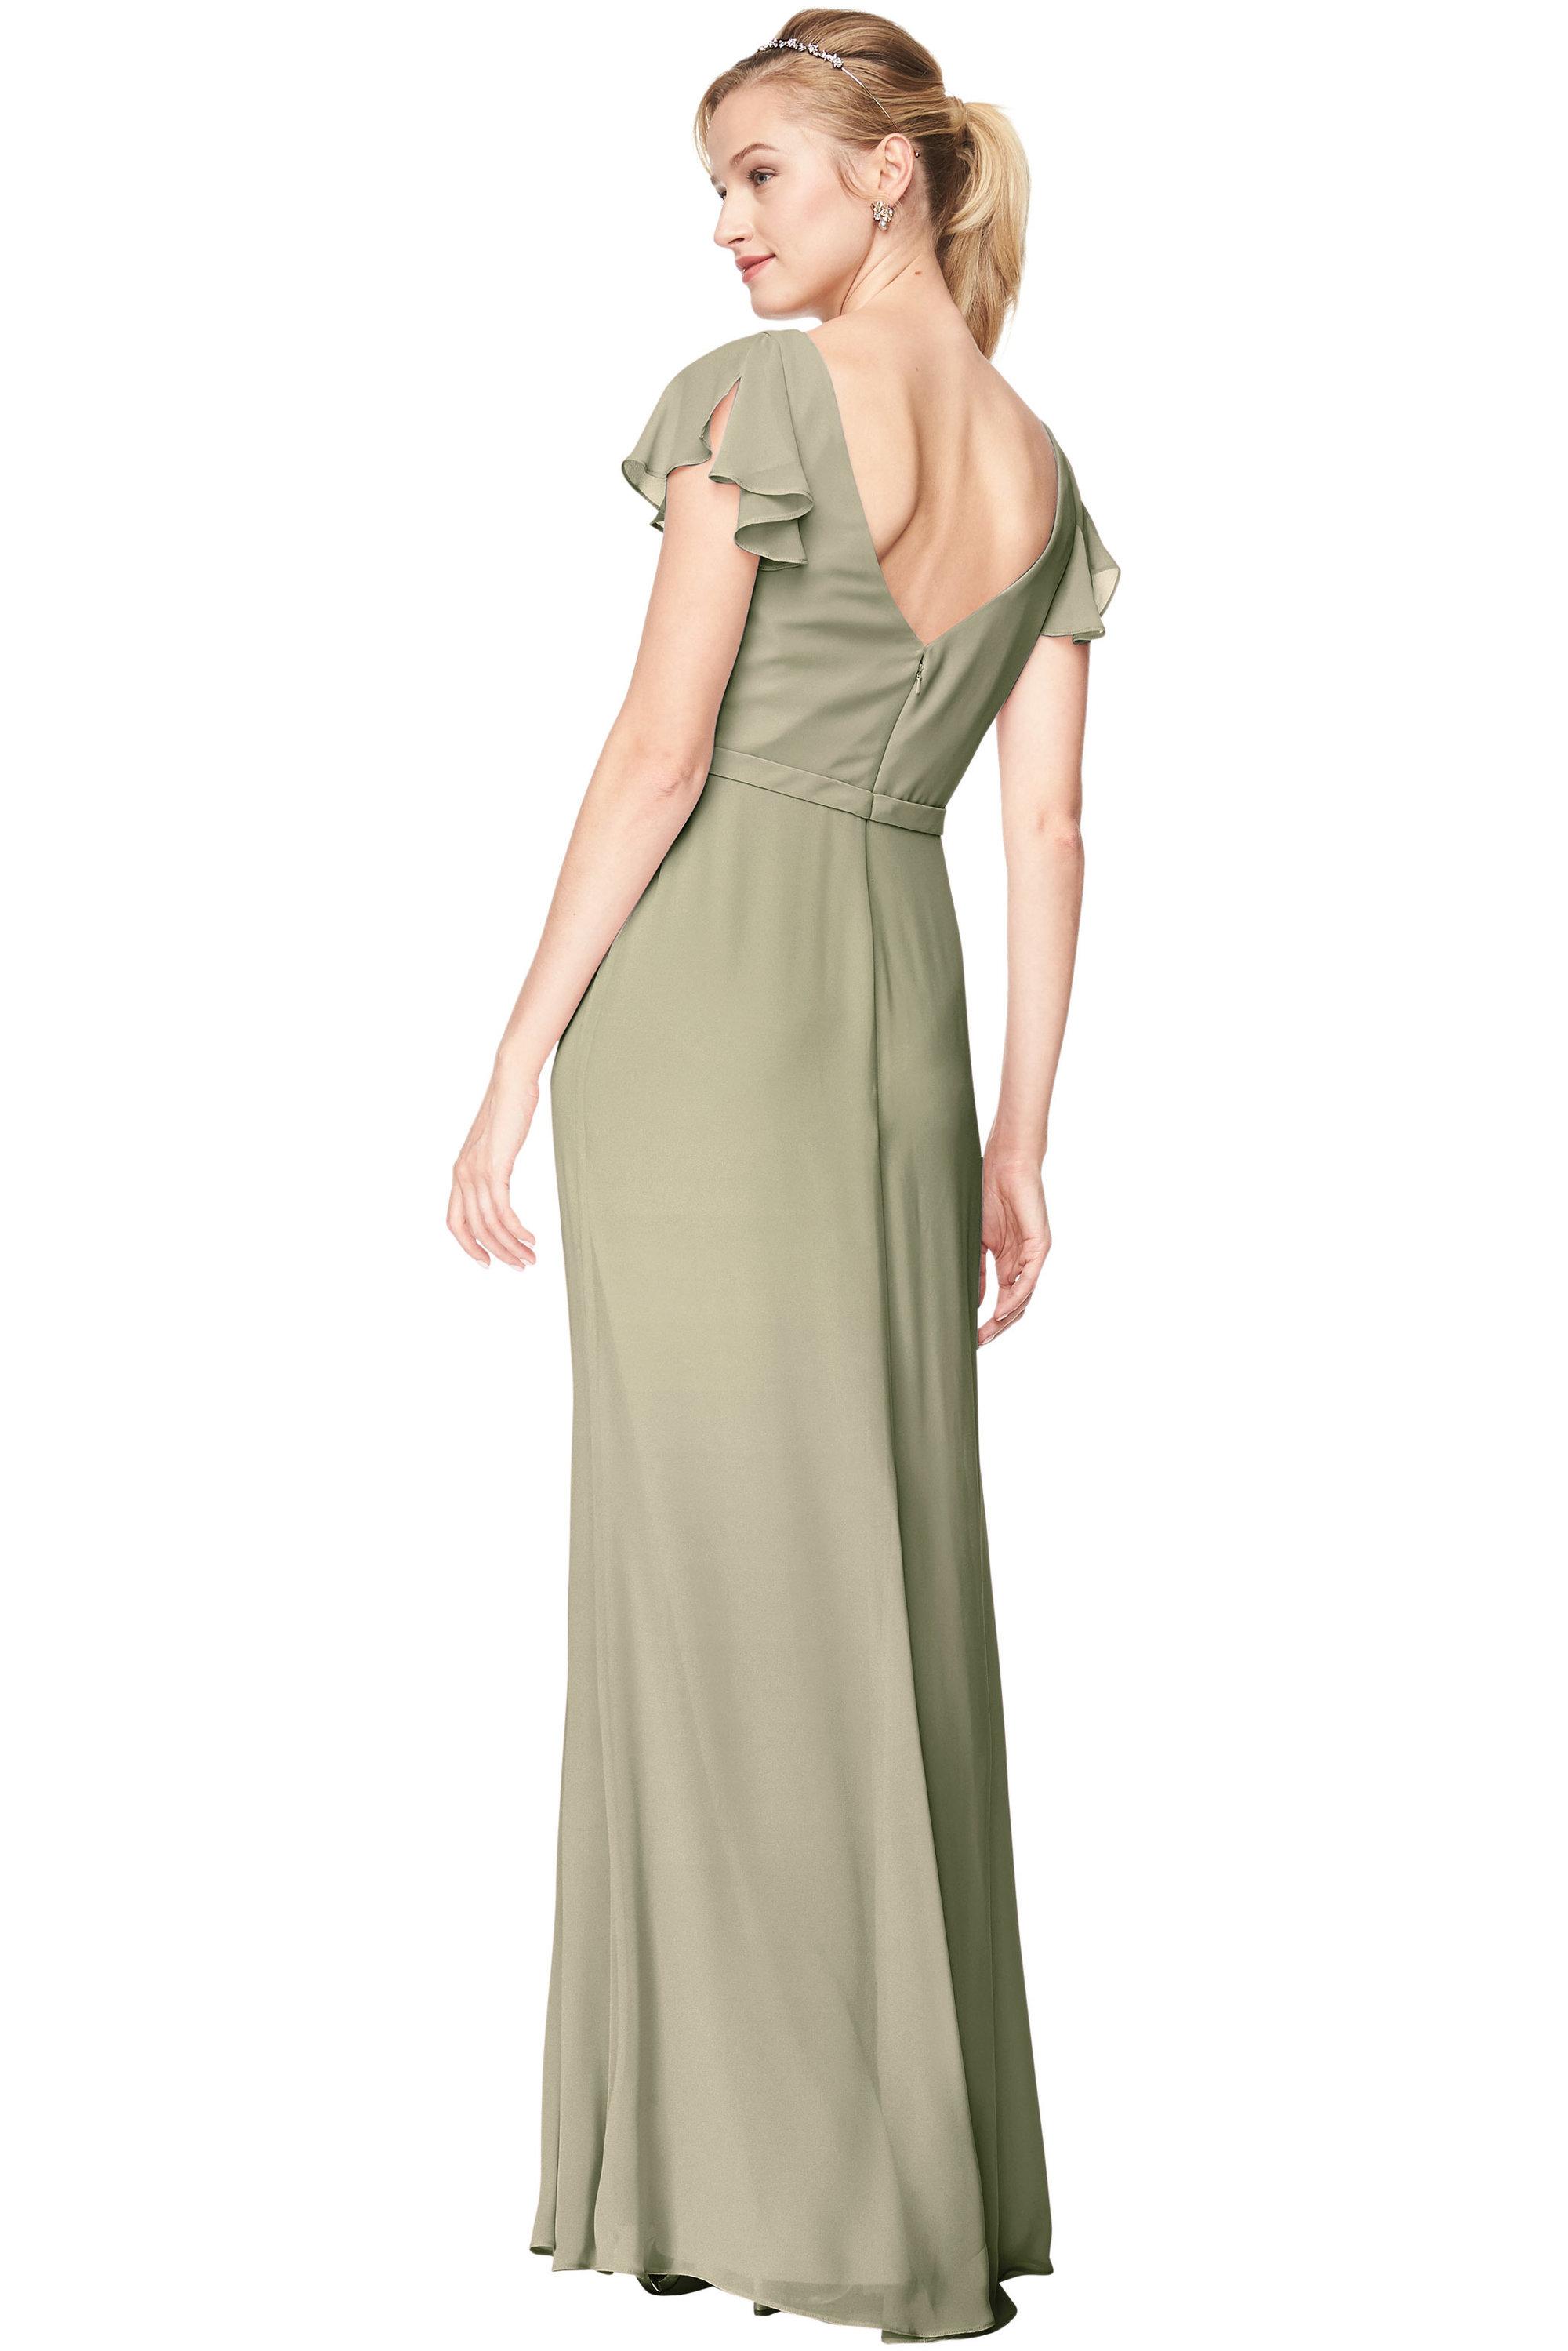 Bill Levkoff PISTACHIO Chiffon V-Neck, Cap Sleeve A-Line gown, $184.00 Back